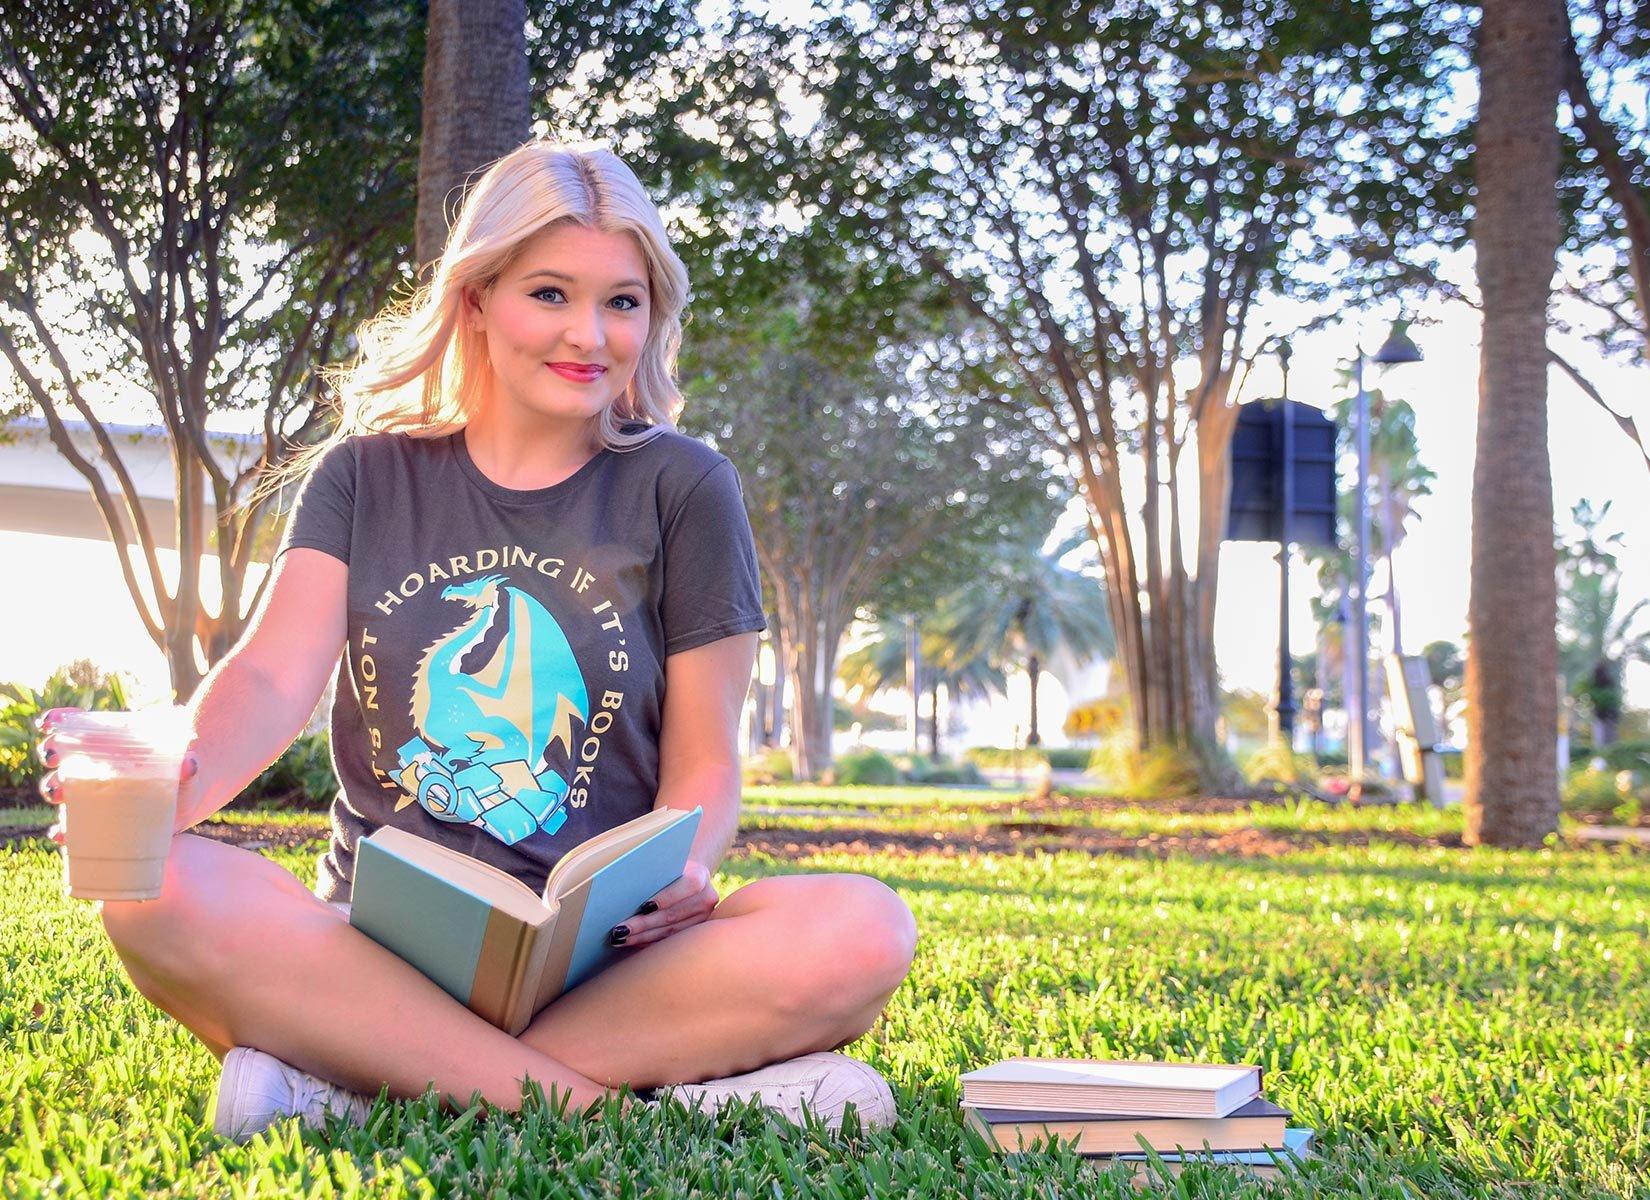 It's Not Hoarding If It's Books on Womens T-Shirt